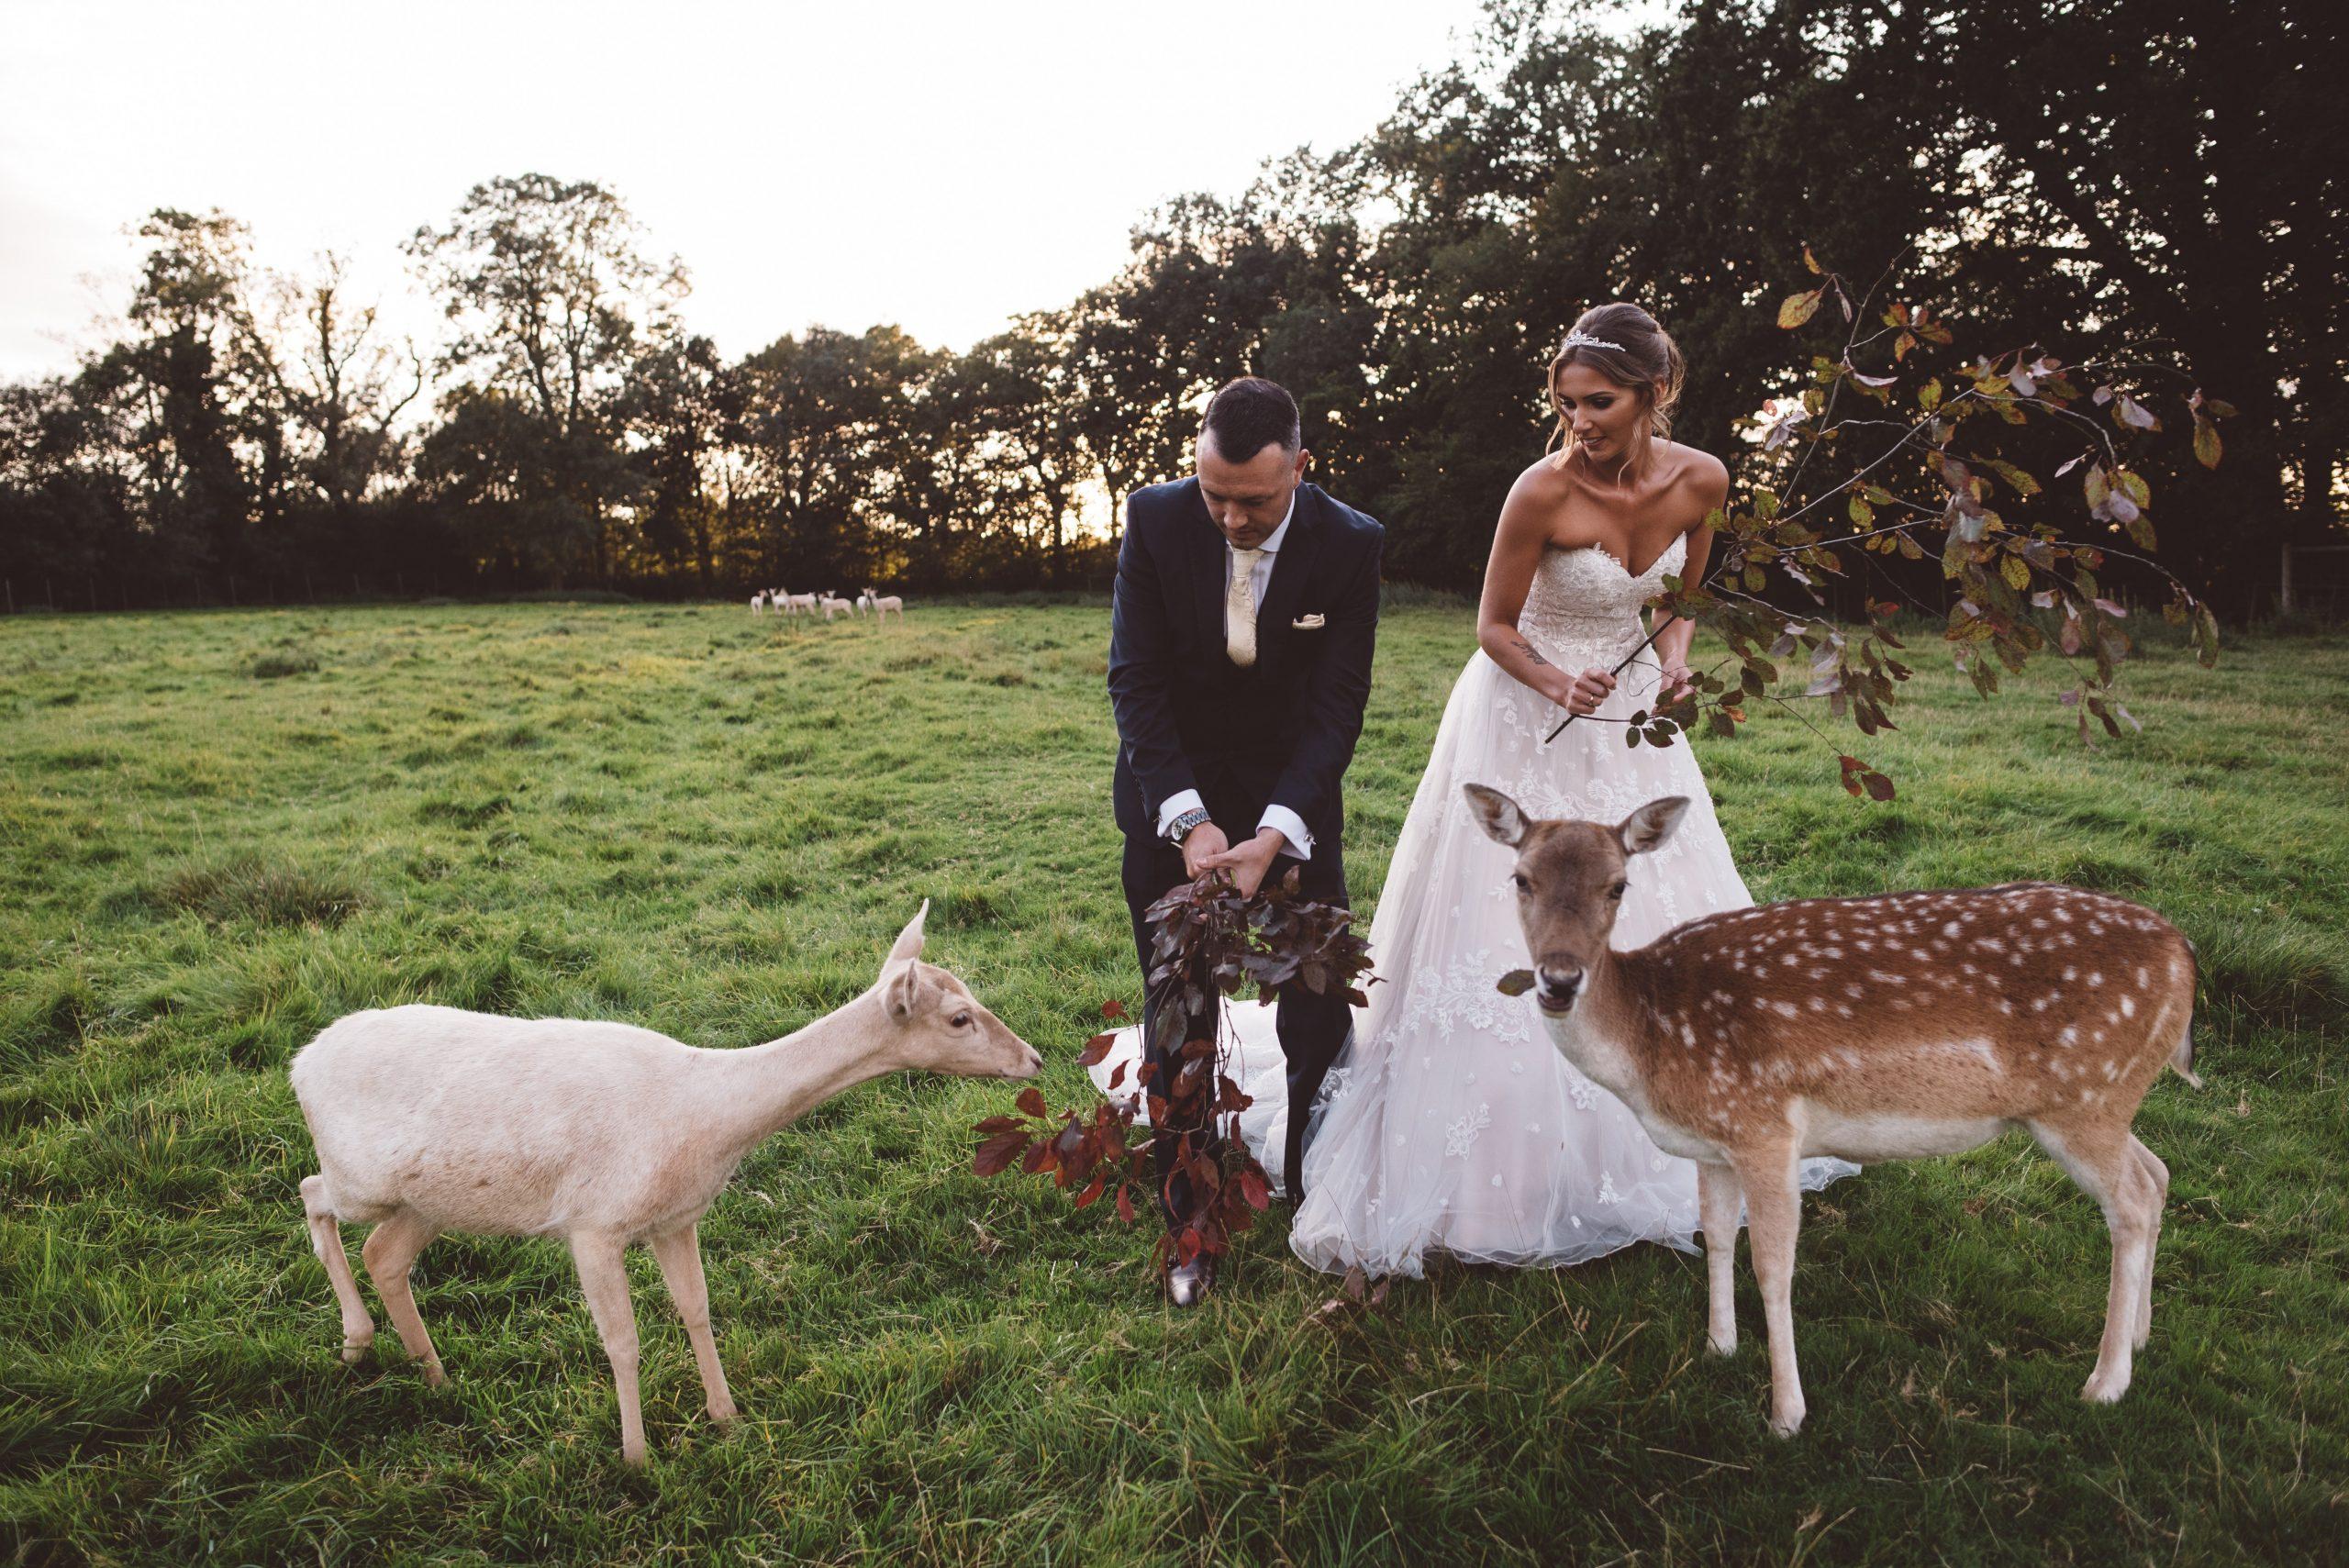 Keythorpe Manor wedding photo with deers